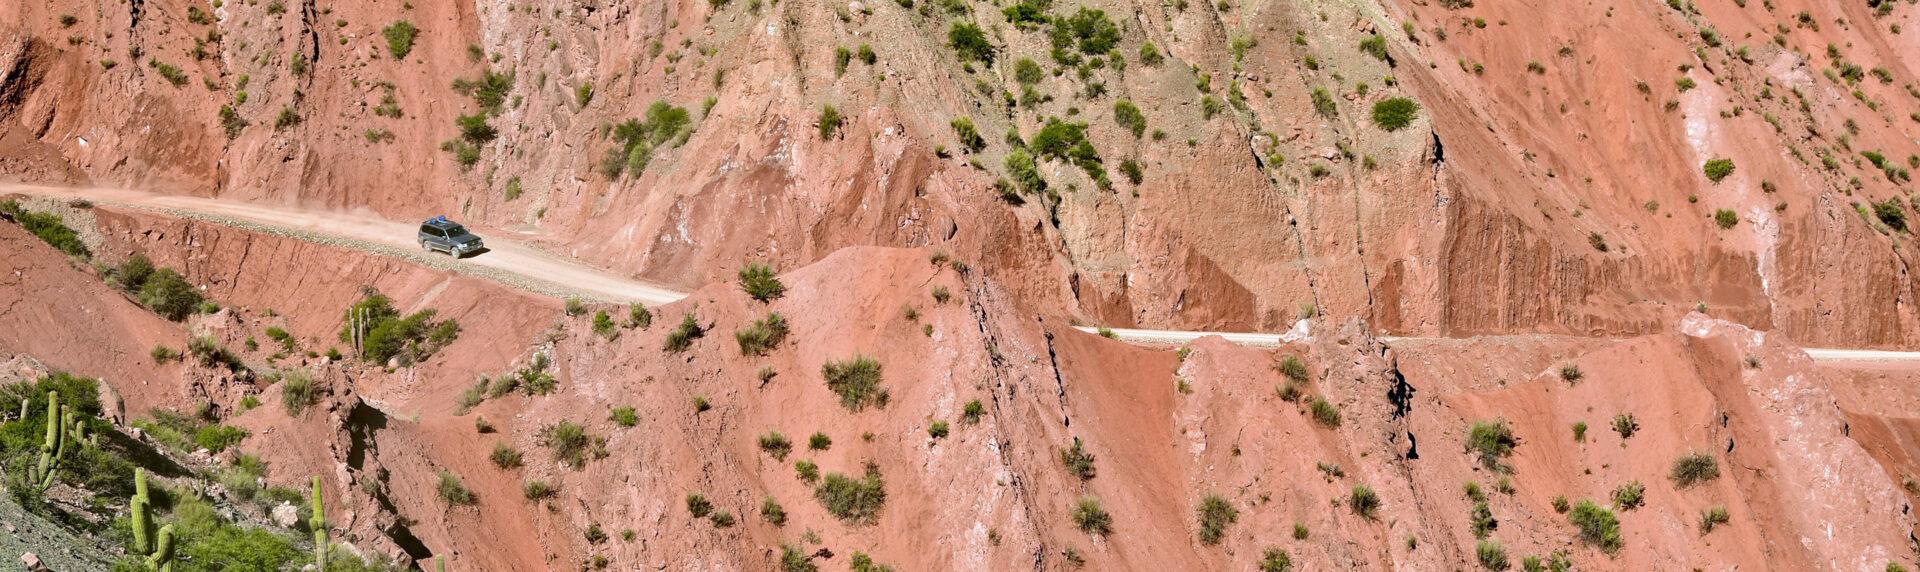 Bolivie Cordillera Lipez Uyuni1